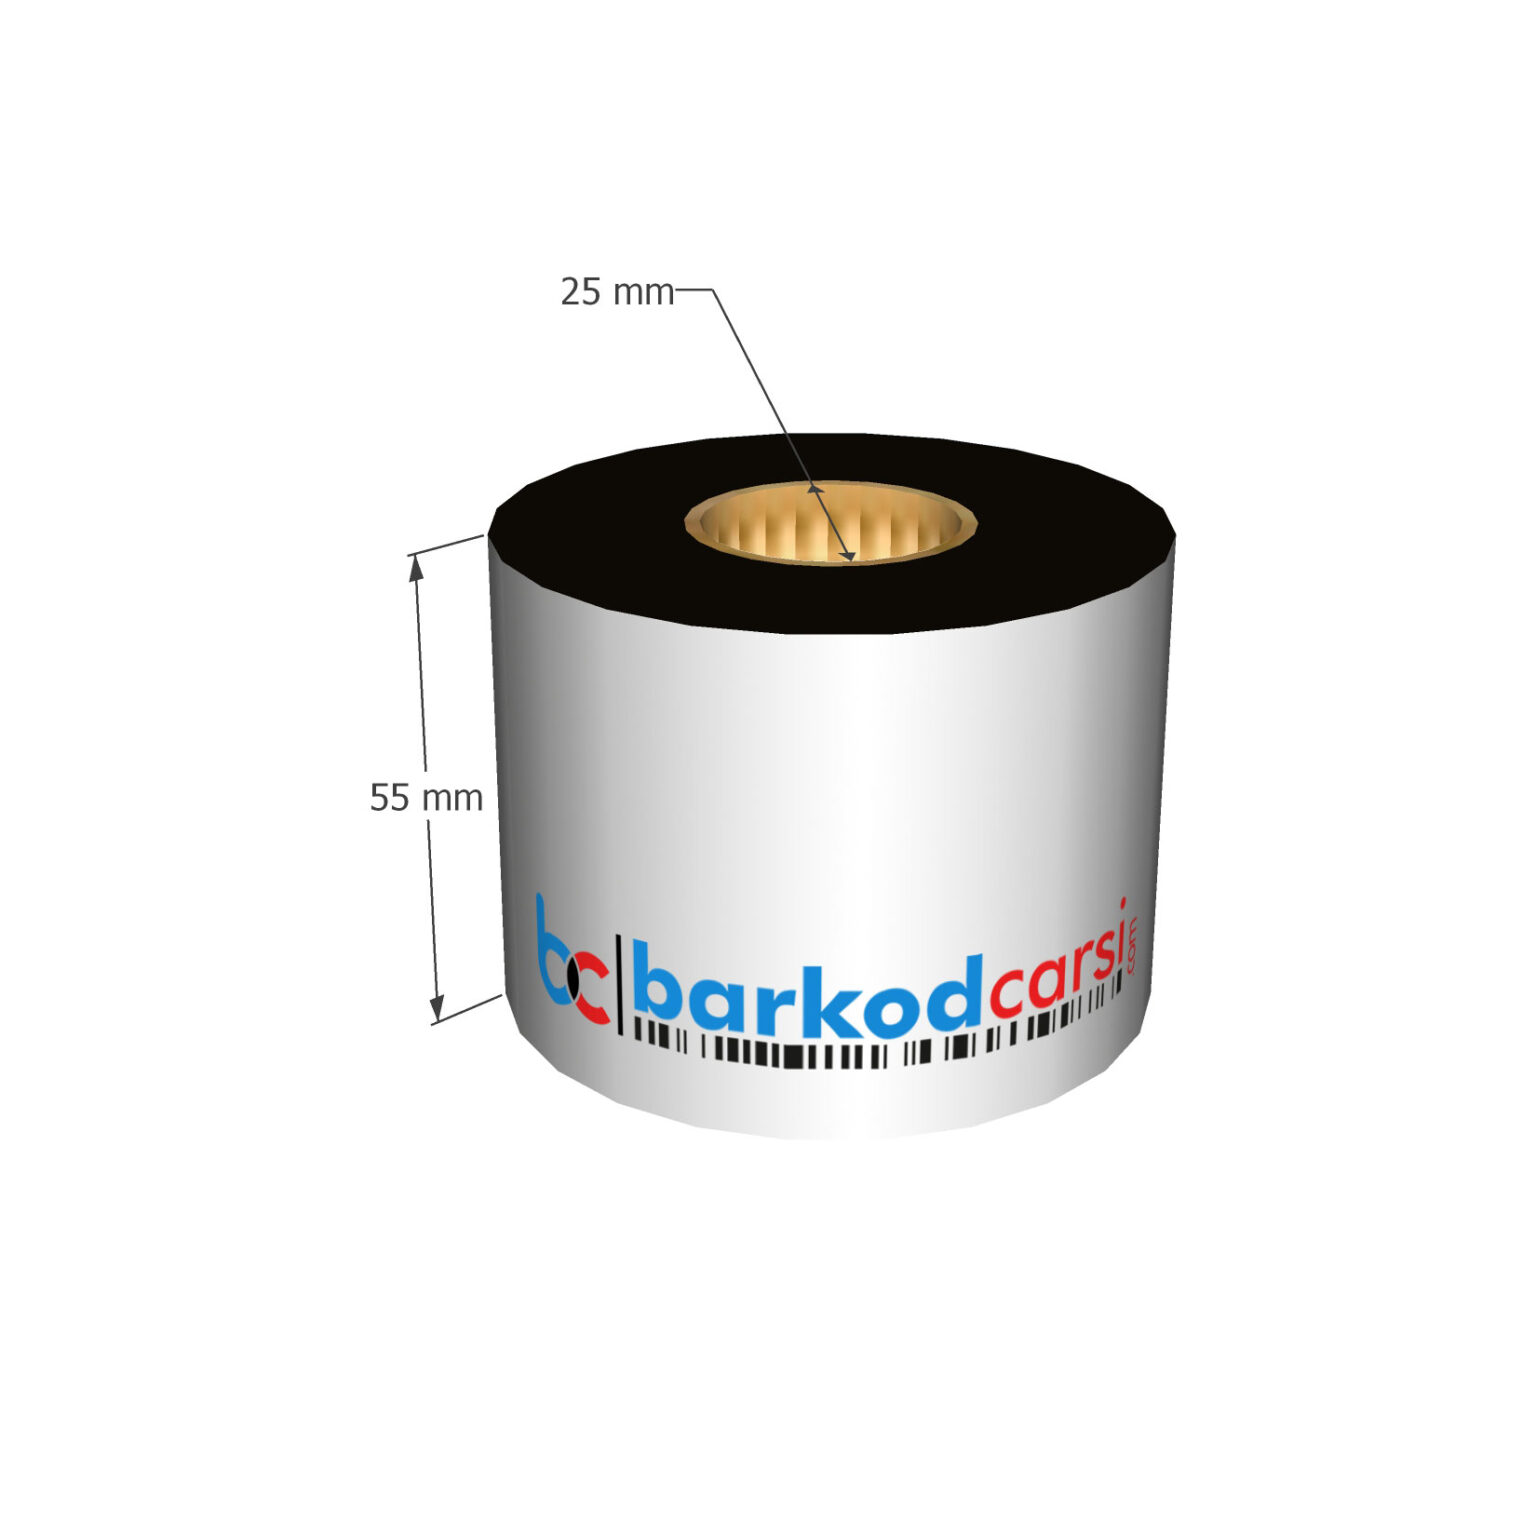 55x300 mt Wax / Wax-Resin / Resin / Hot-Foil Ribon Çeşitleri By BarkodCarsi.com